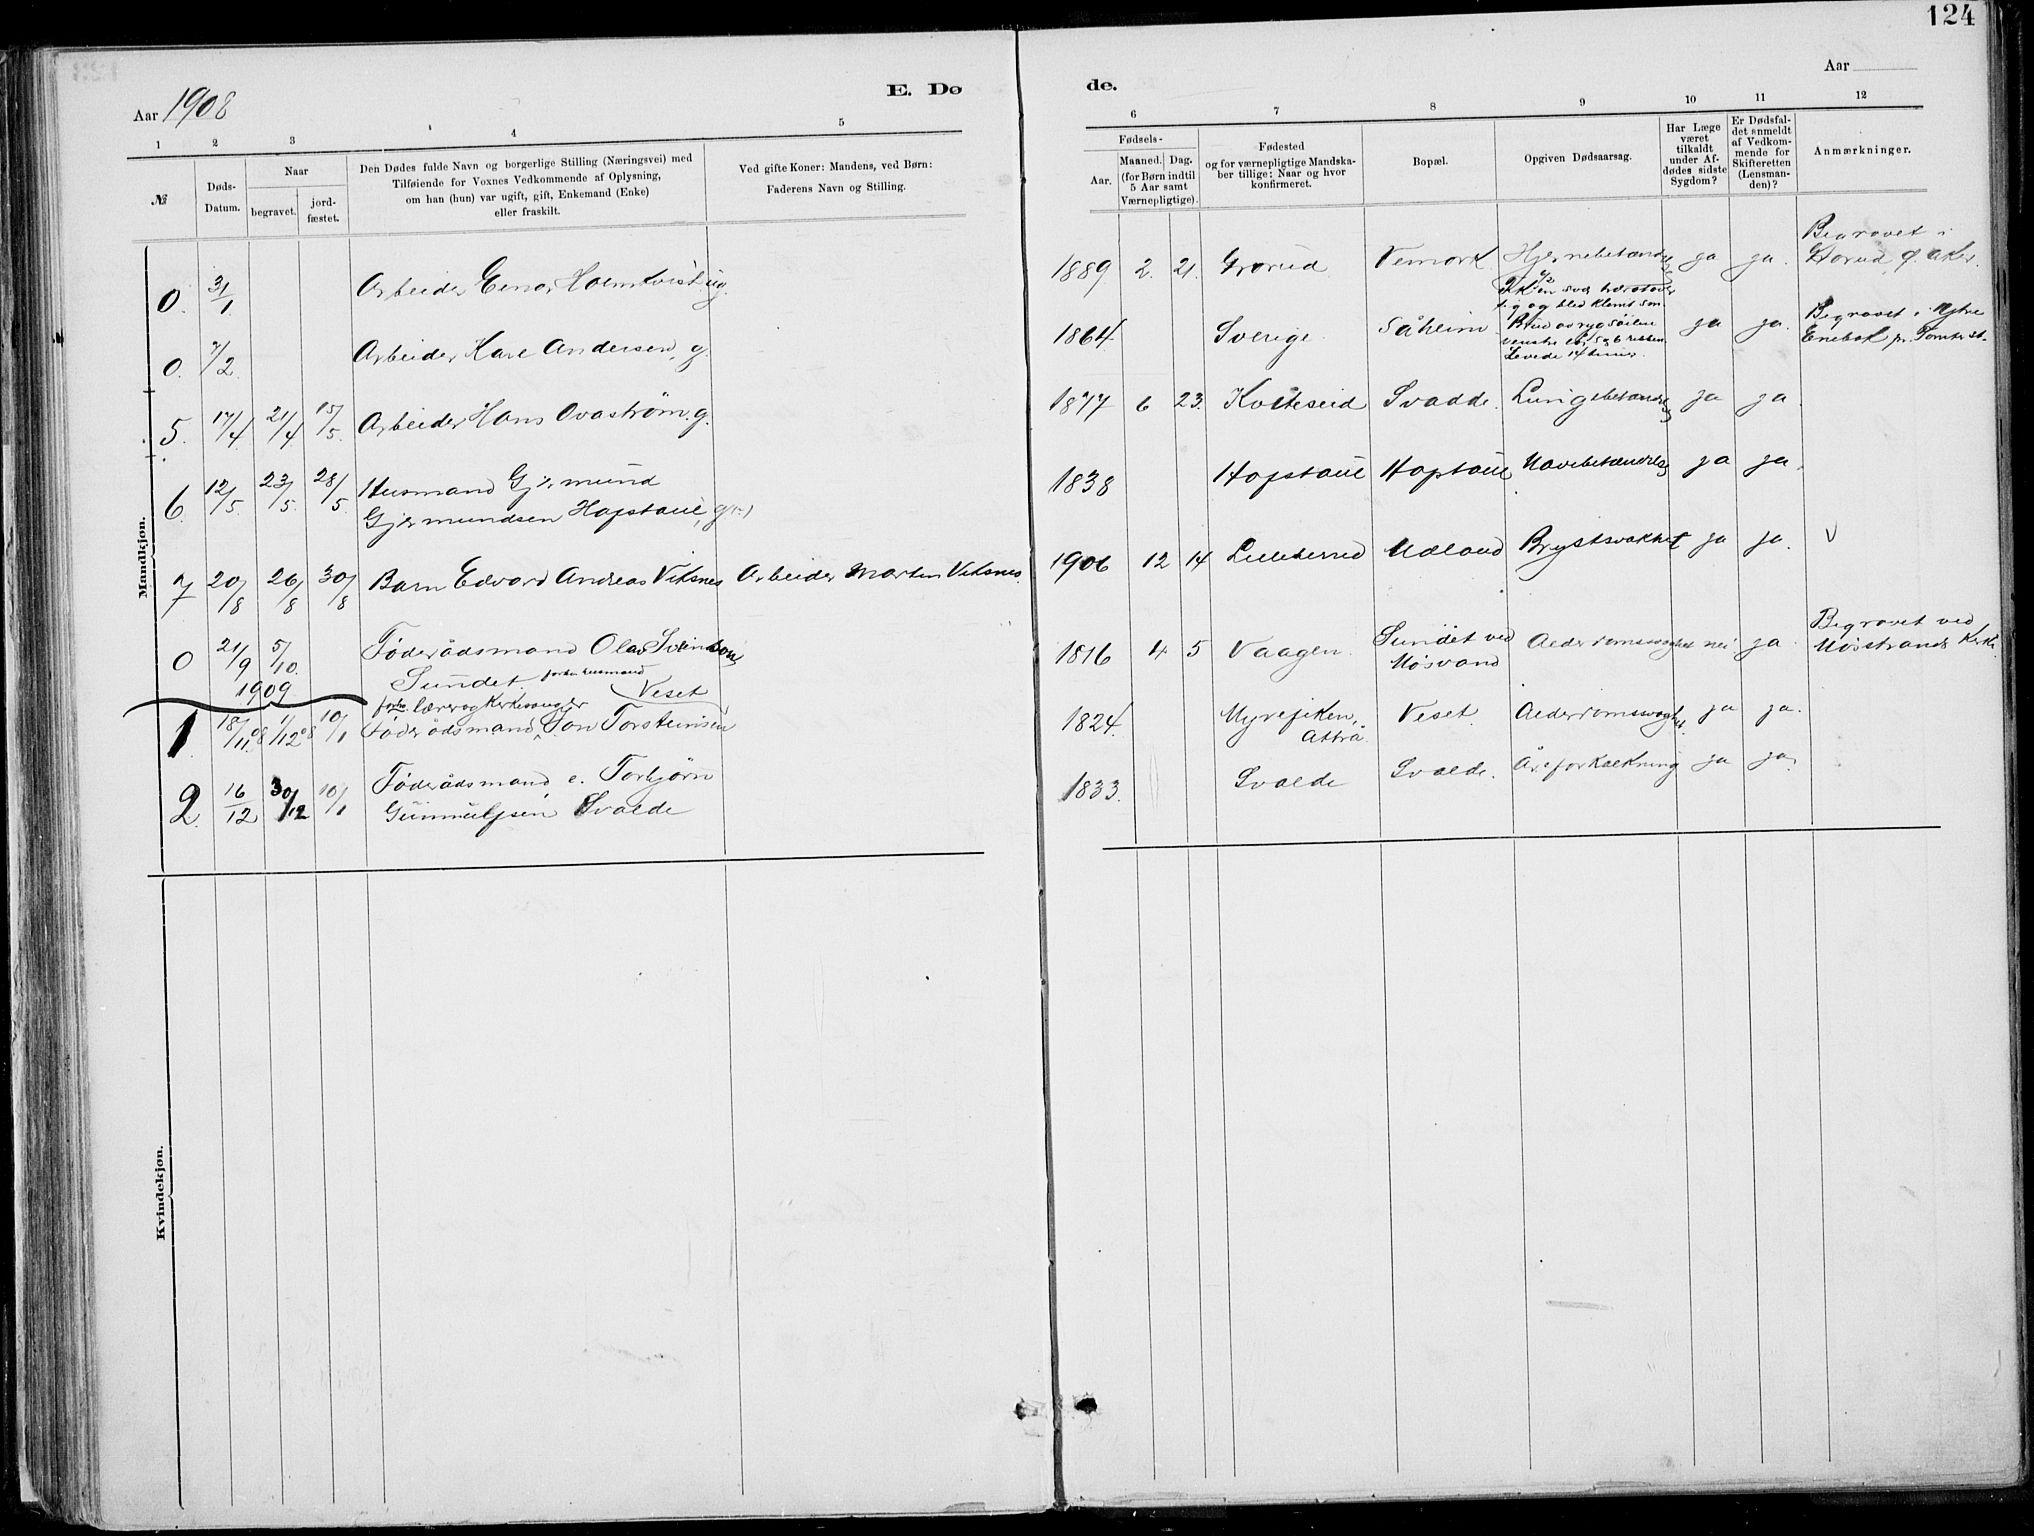 SAKO, Rjukan kirkebøker, F/Fa/L0001: Ministerialbok nr. 1, 1878-1912, s. 124